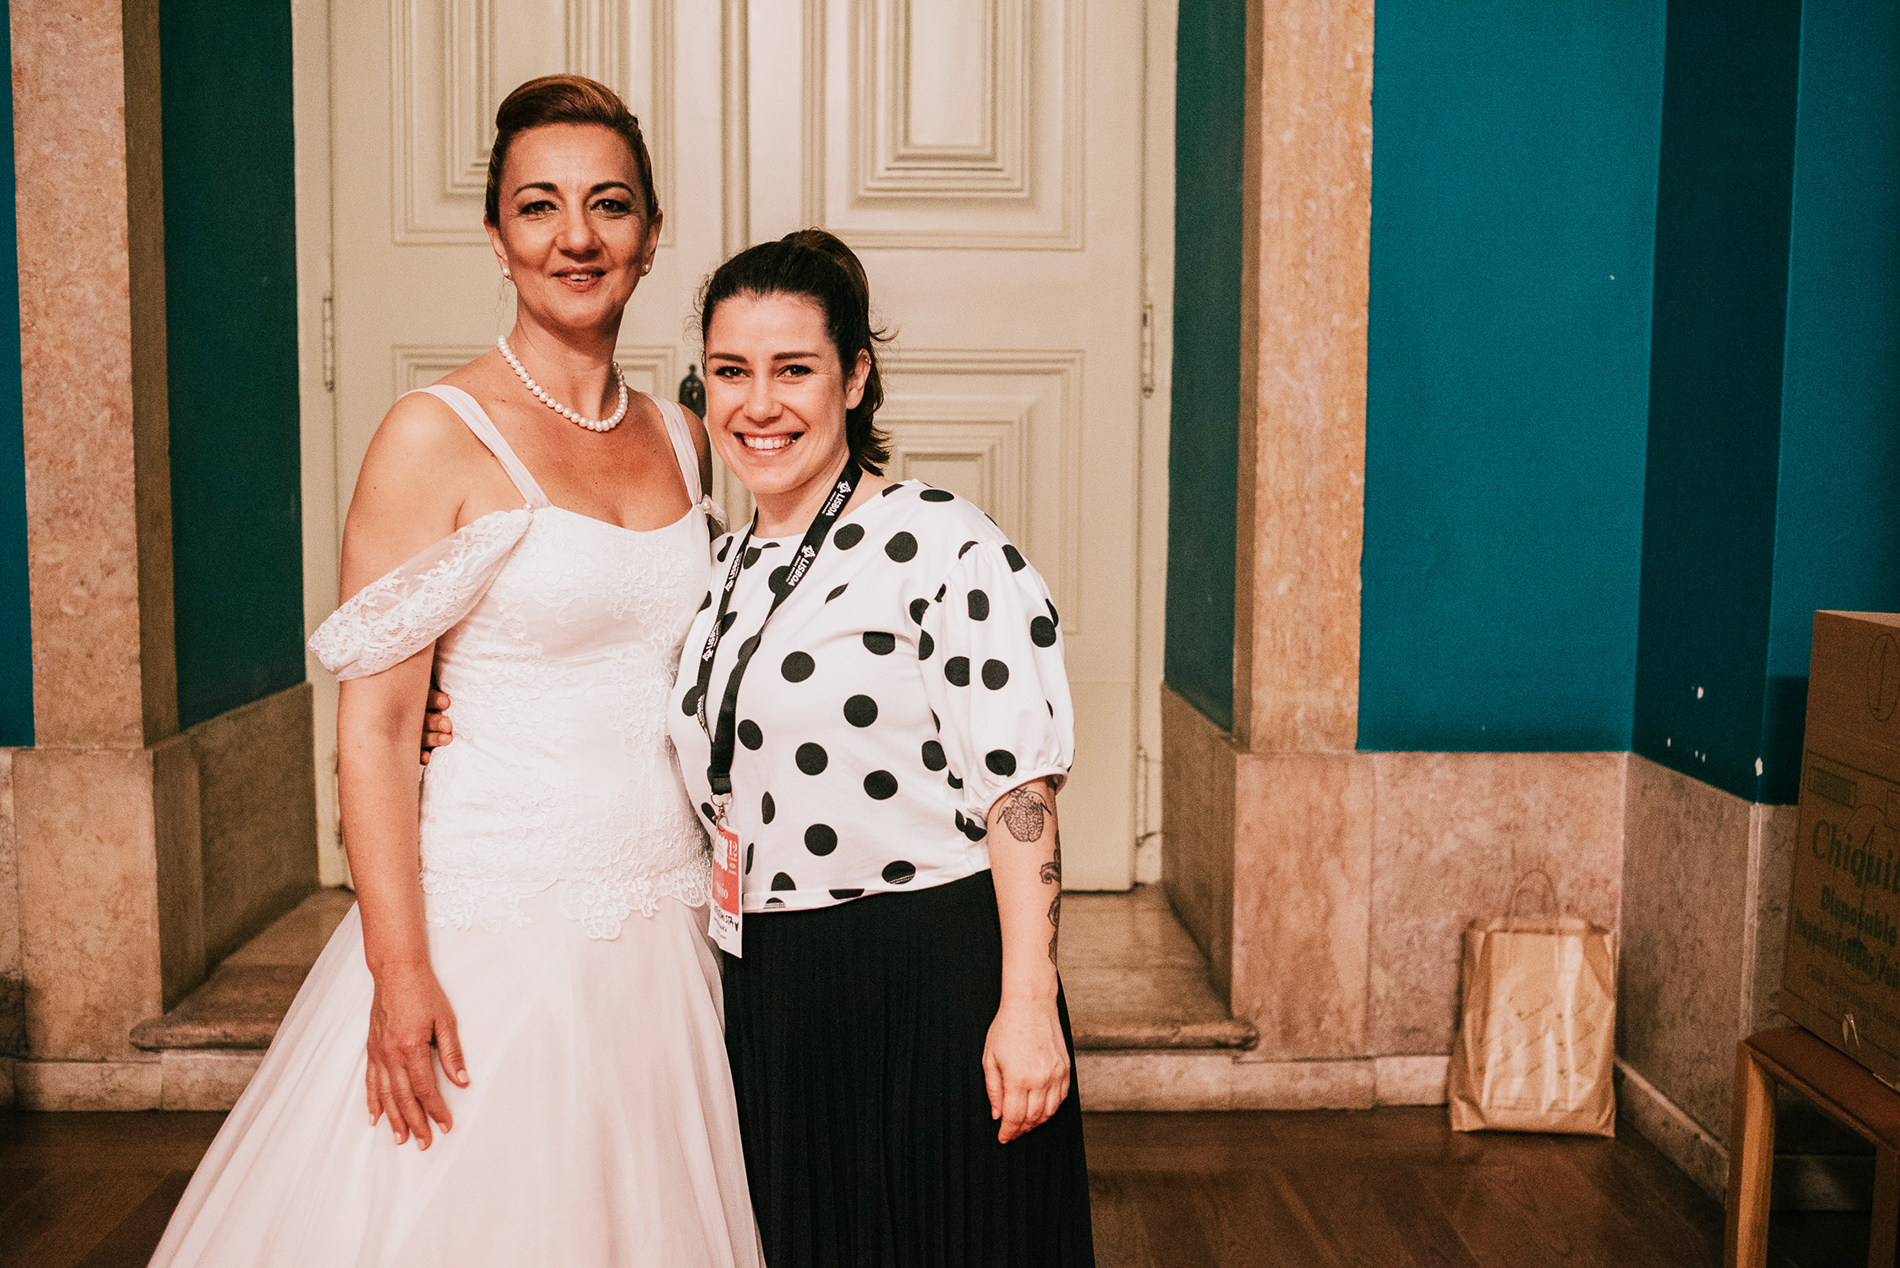 Behind the Scenes of a Wedding Behind the scenes RAP 47